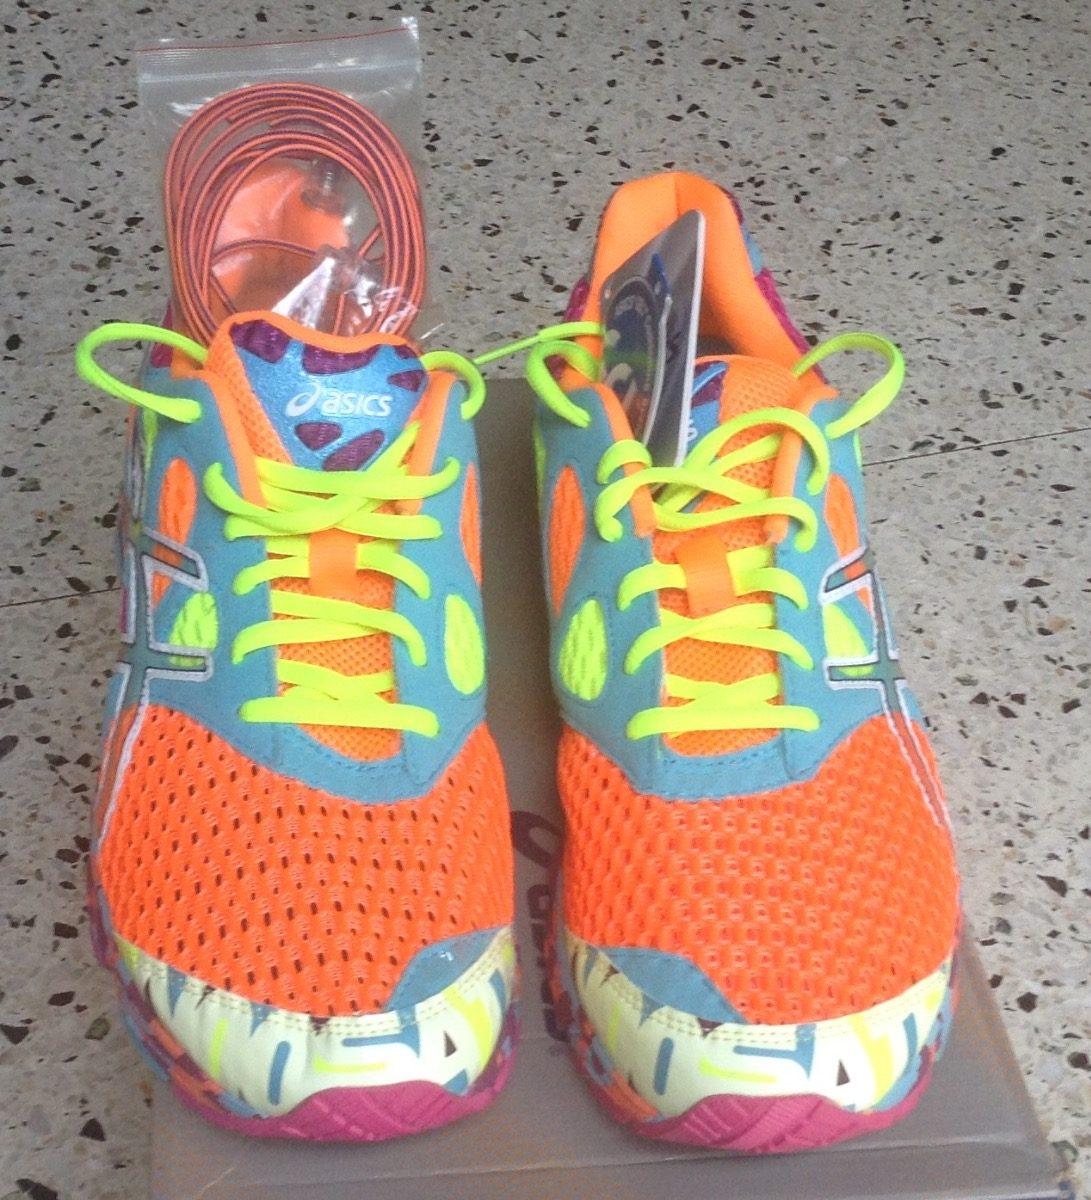 Do ResBs5 Asics Originales 000 55 00 Zapatos La En 6b7fgy